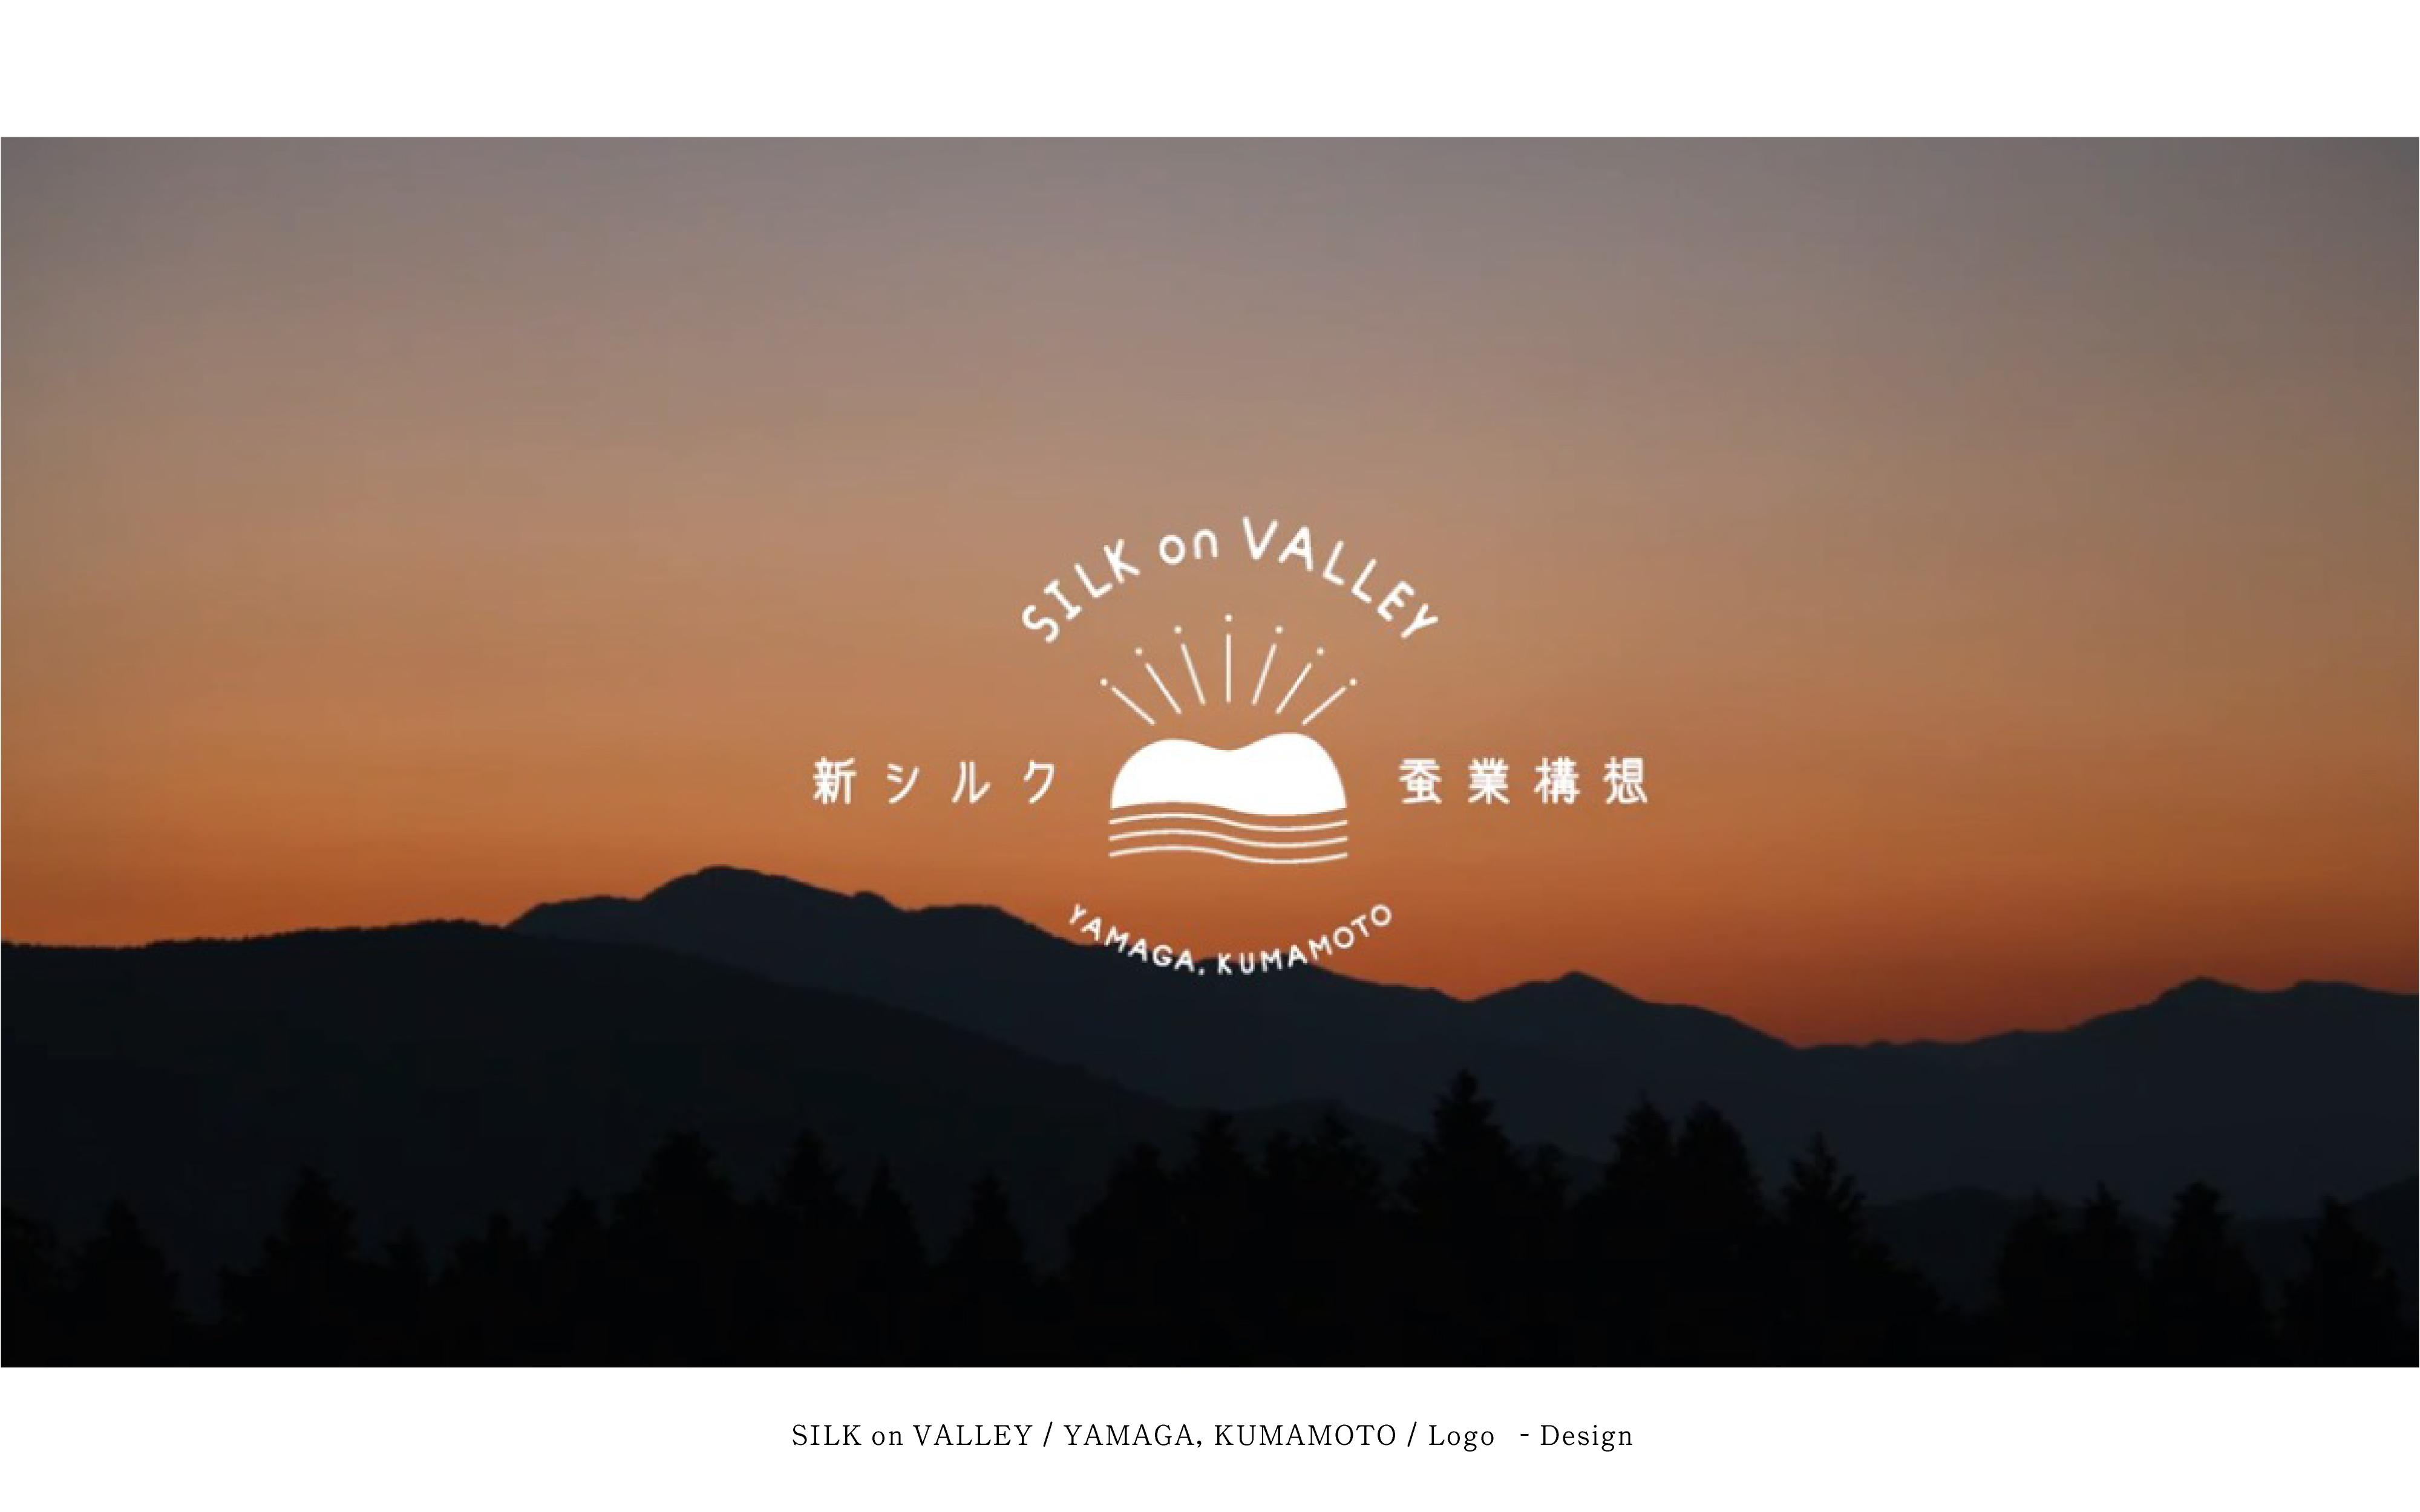 SILK on VALLEY 新シルク蚕業構想 Logo Design